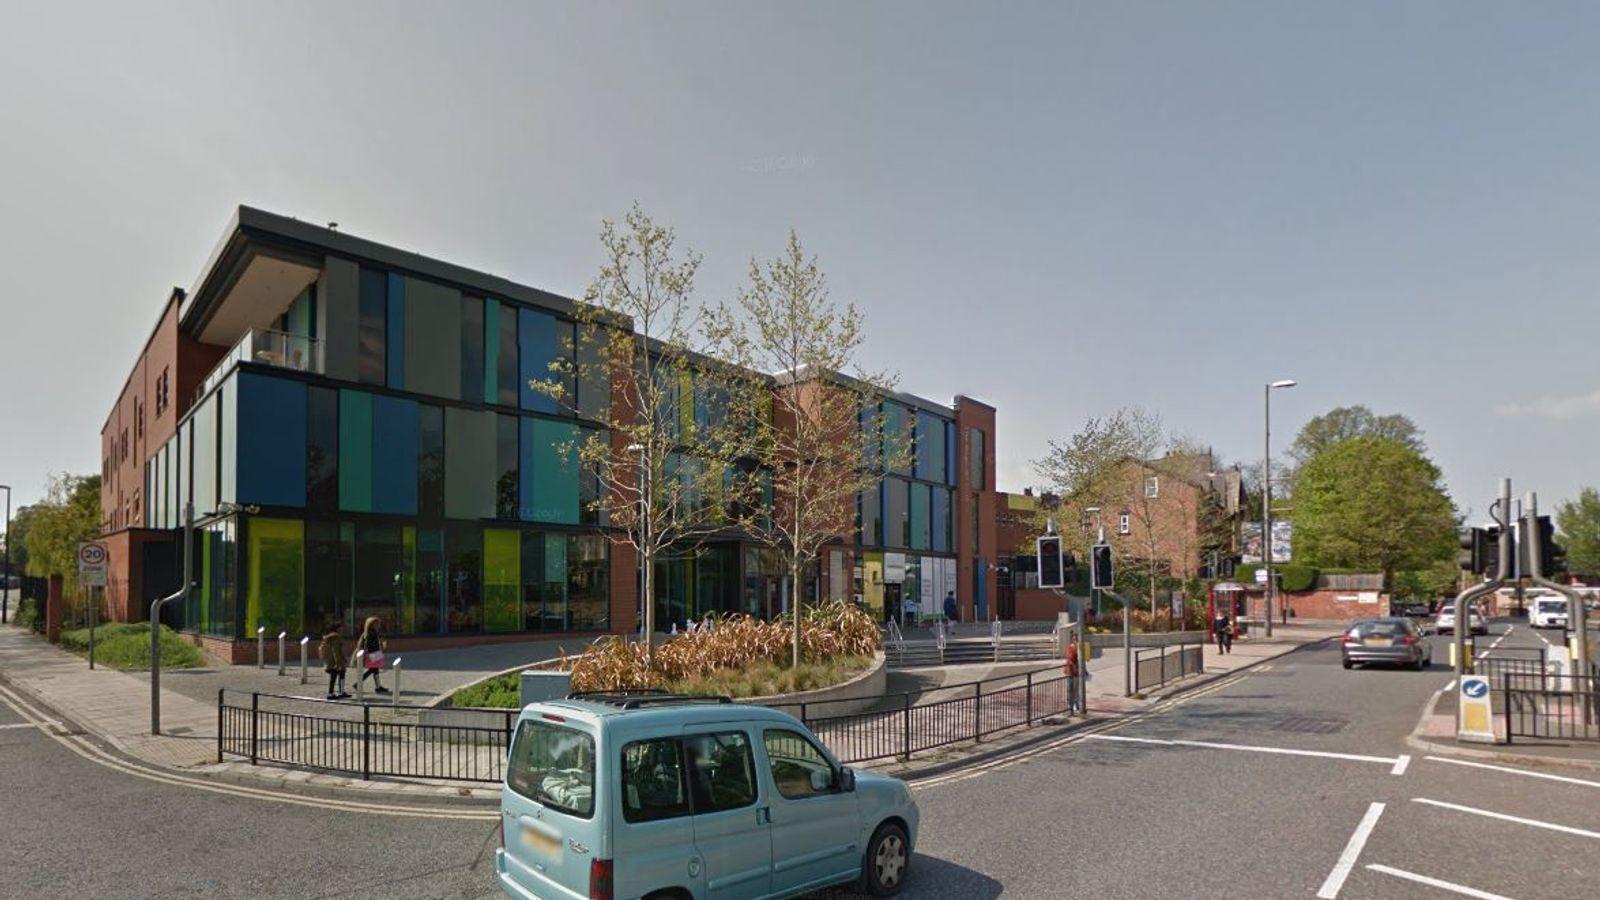 Boy dies after being hit by car in Leeds